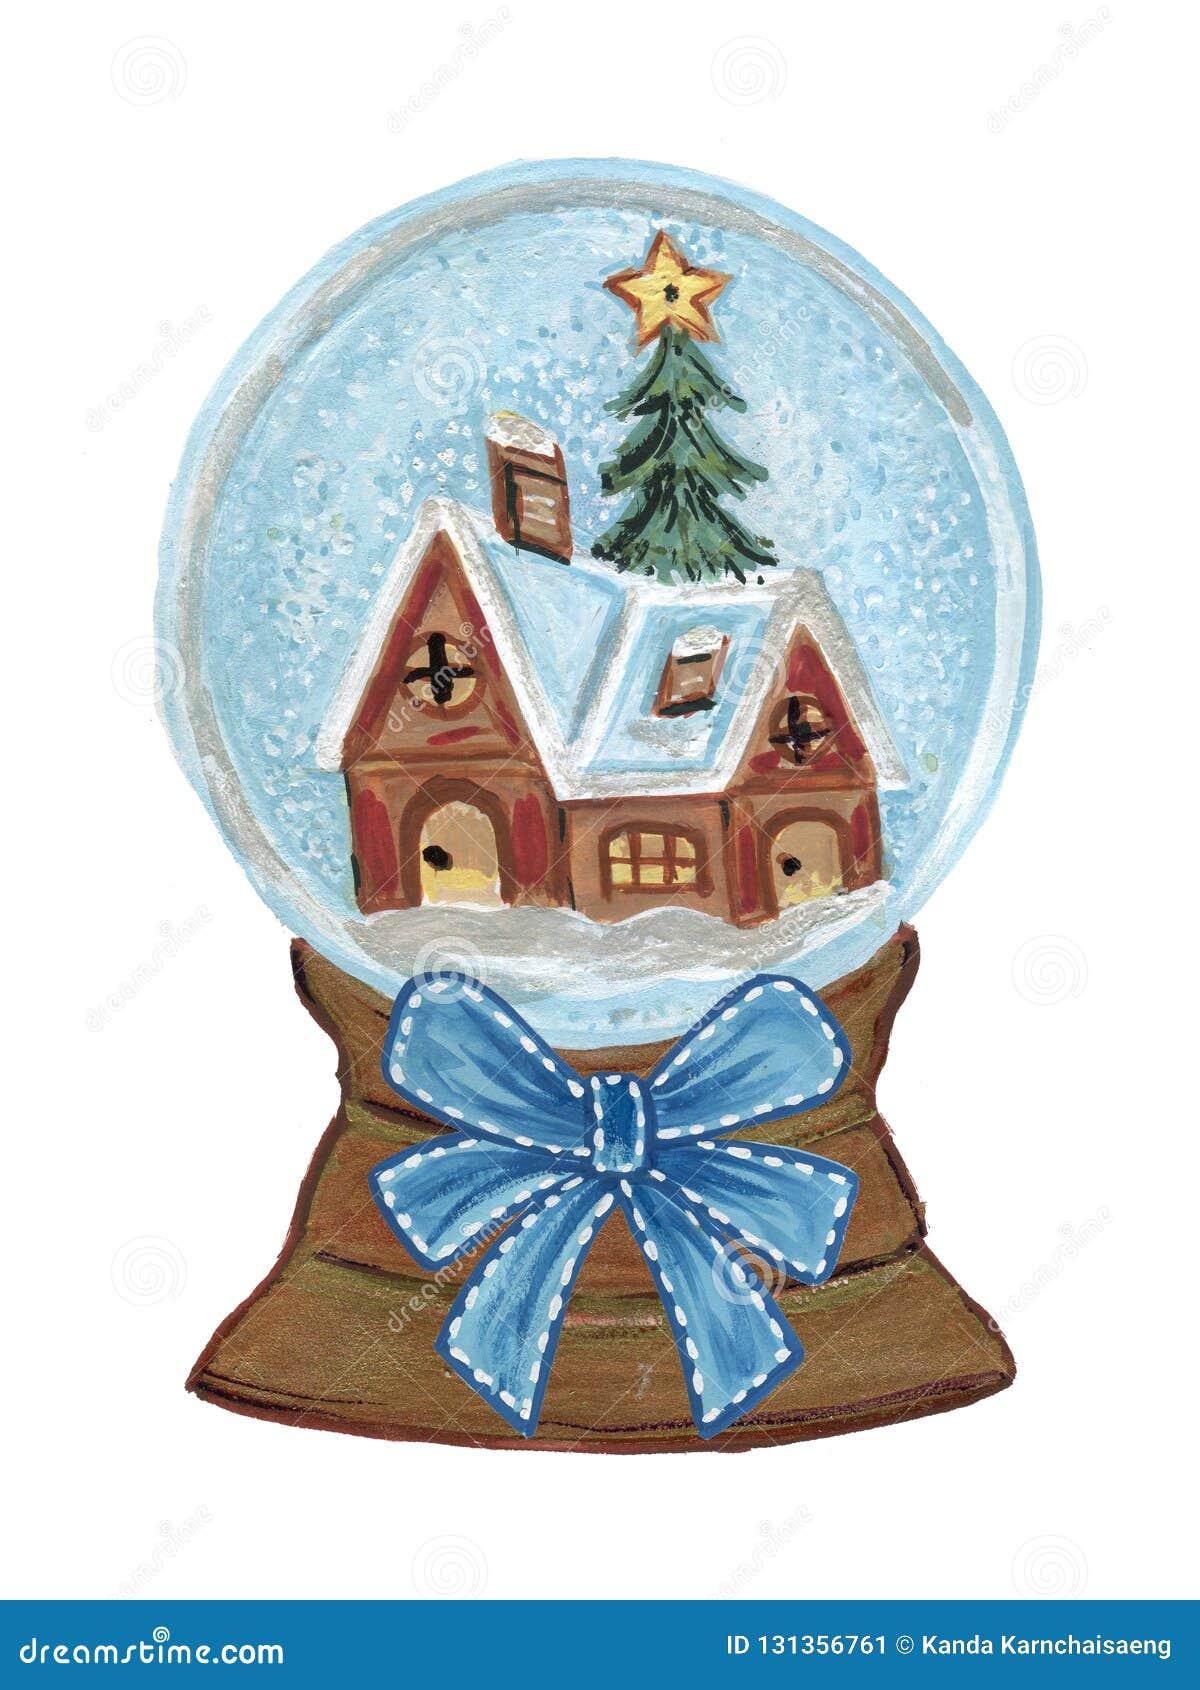 Vintage Christmas Snow Globes.Vintage Christmas Snow Globe House And Christmas Tree And